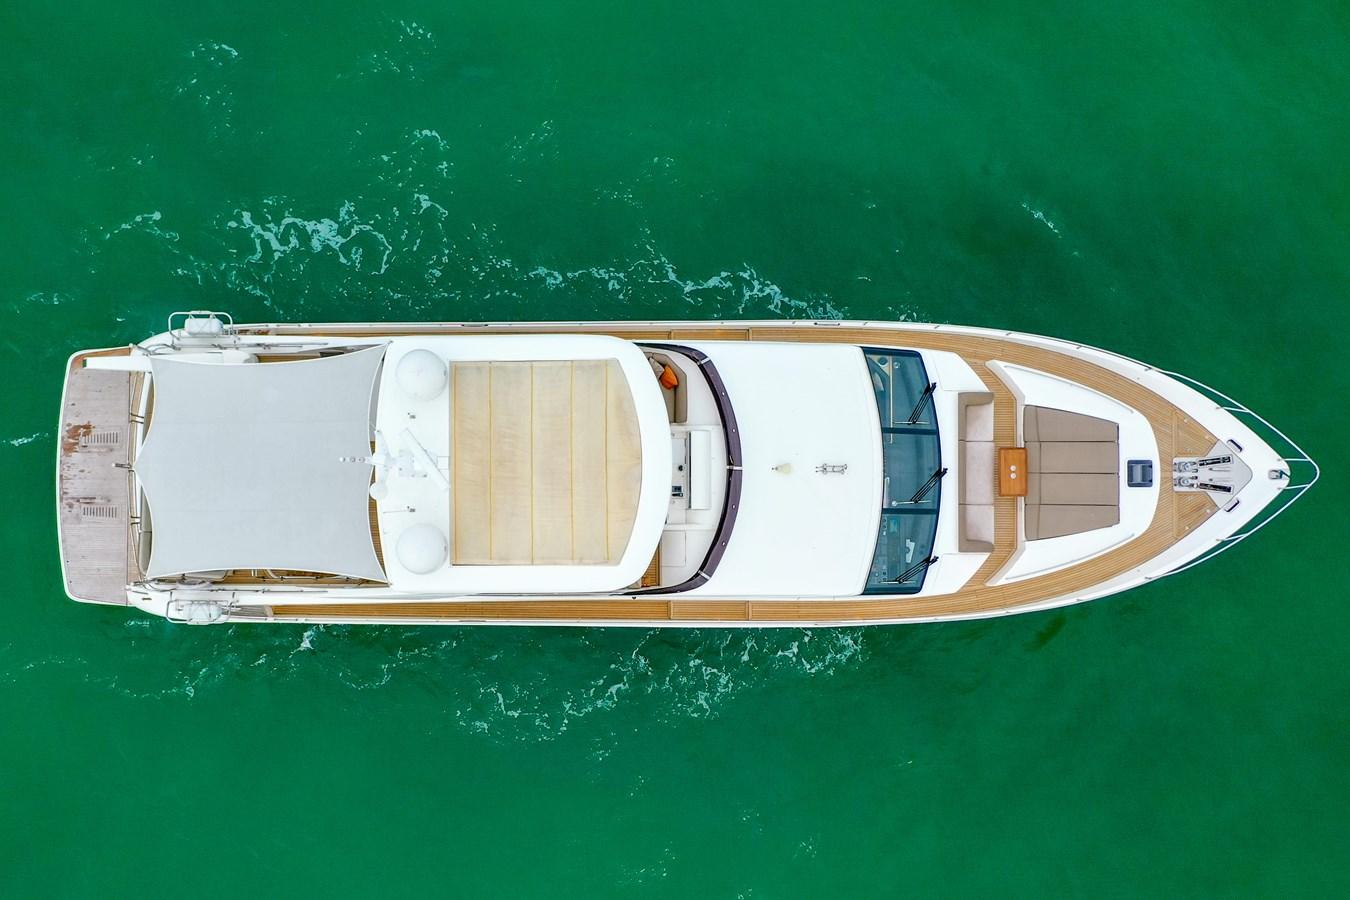 Princess 85 yacht for sale